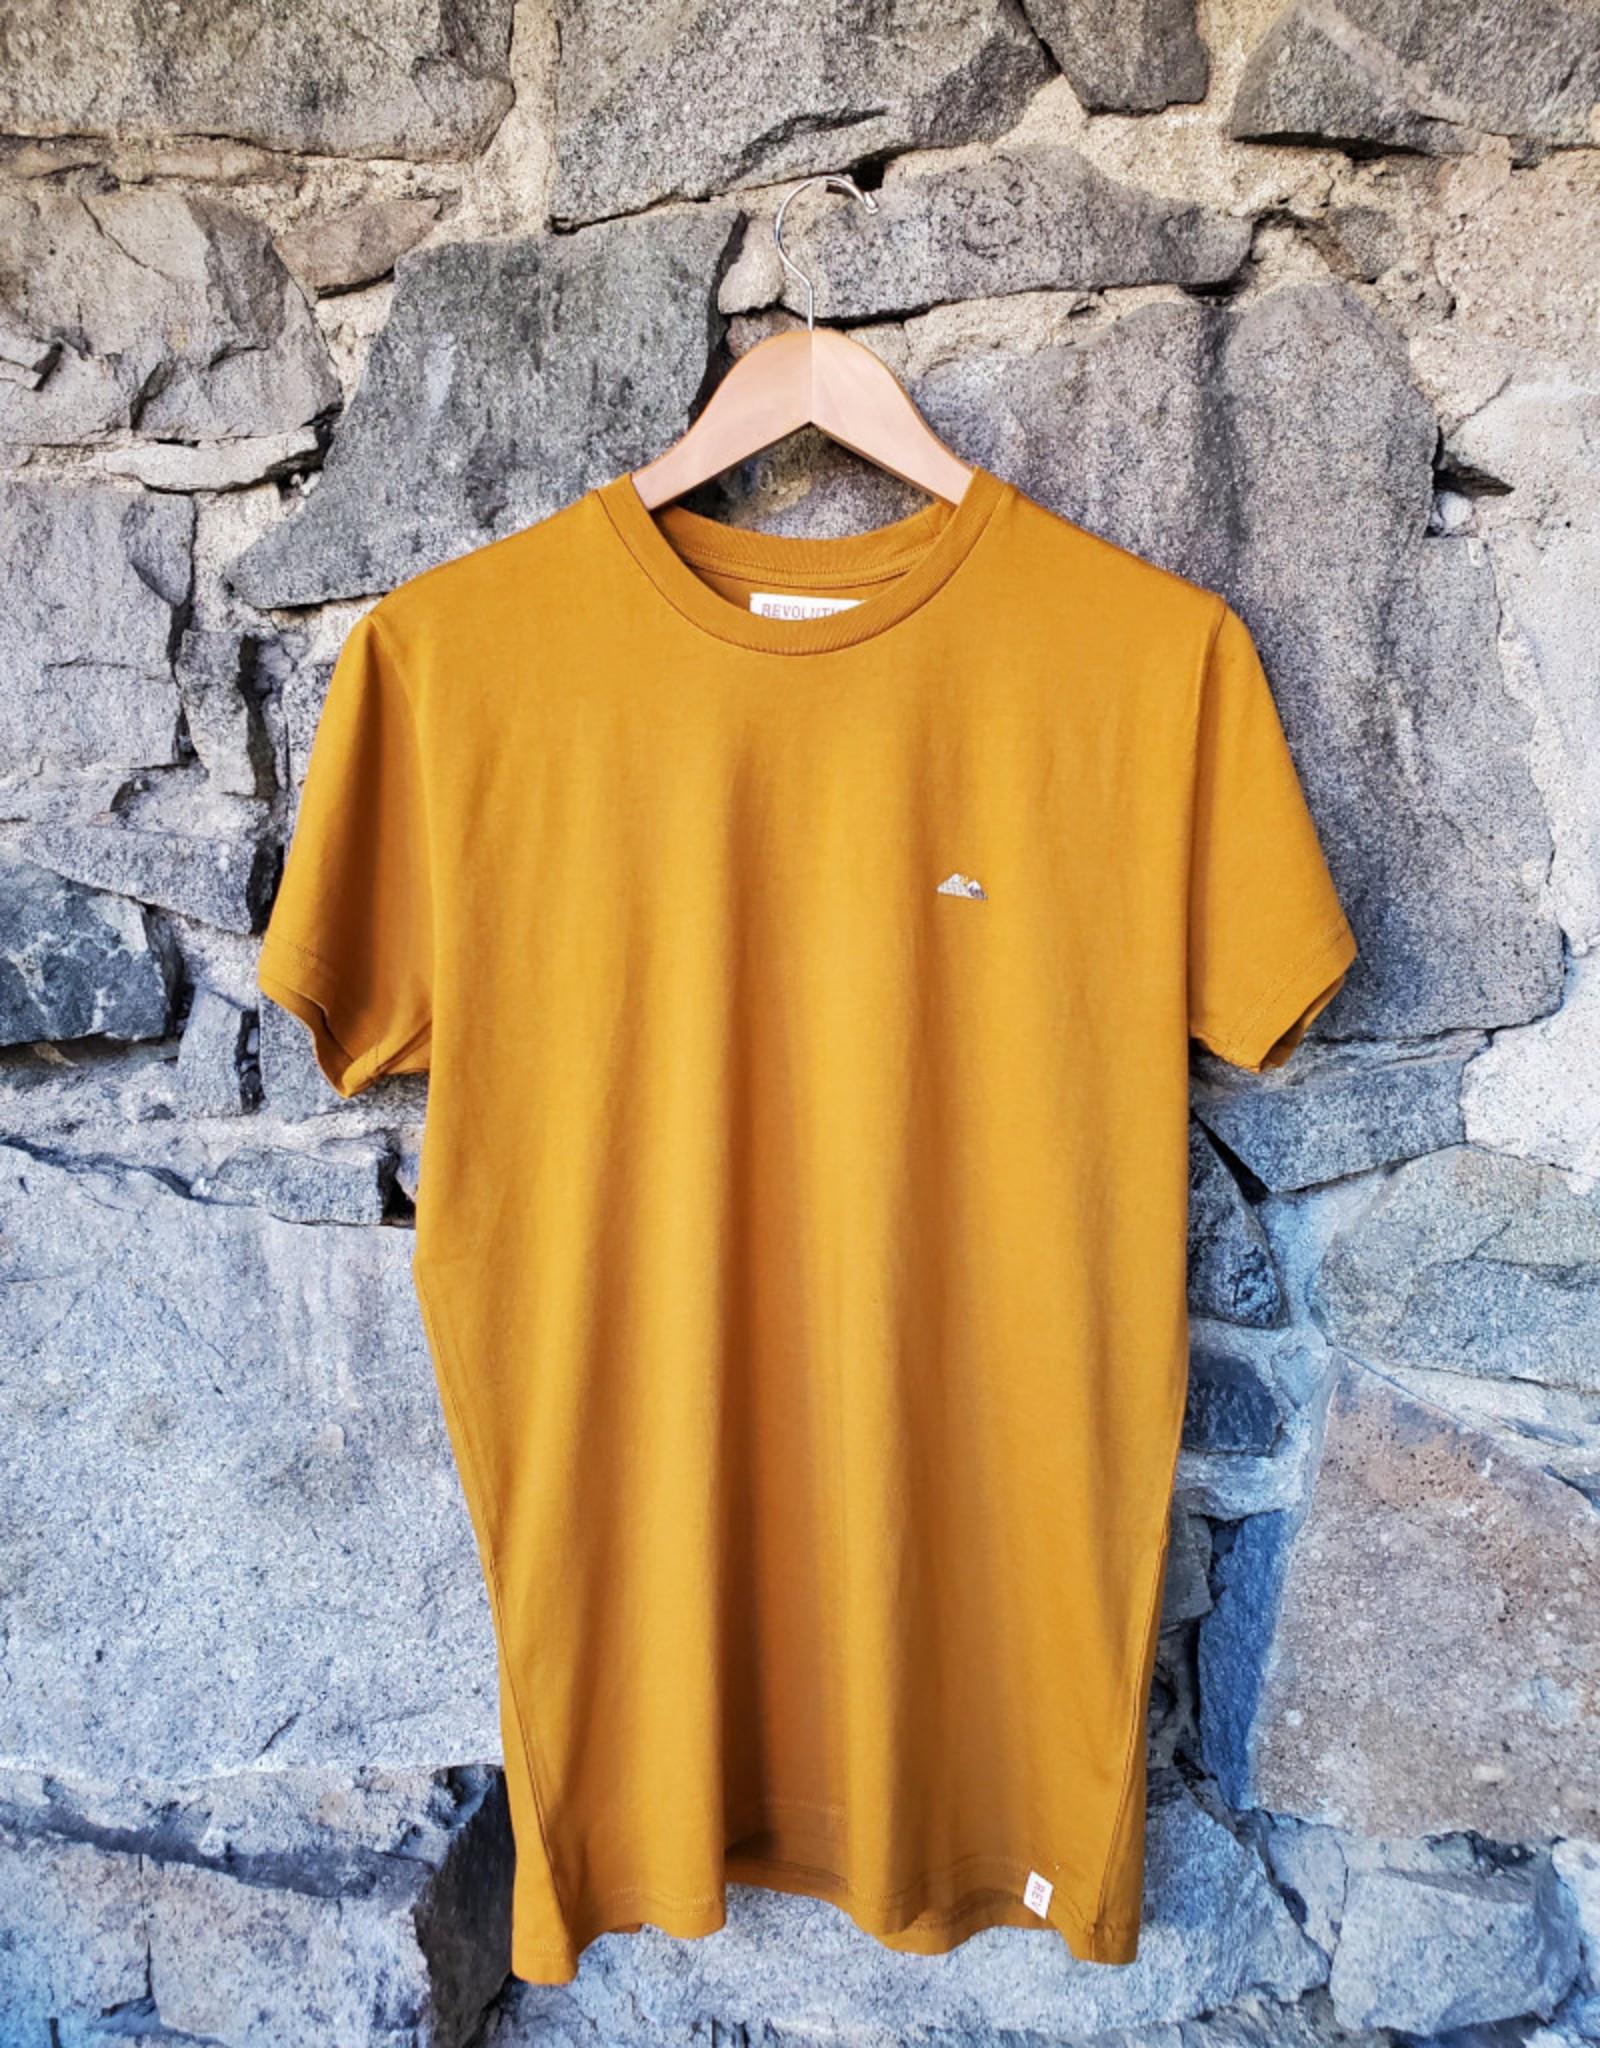 RVLT 1200 MOU Application T-Shirt - Brown